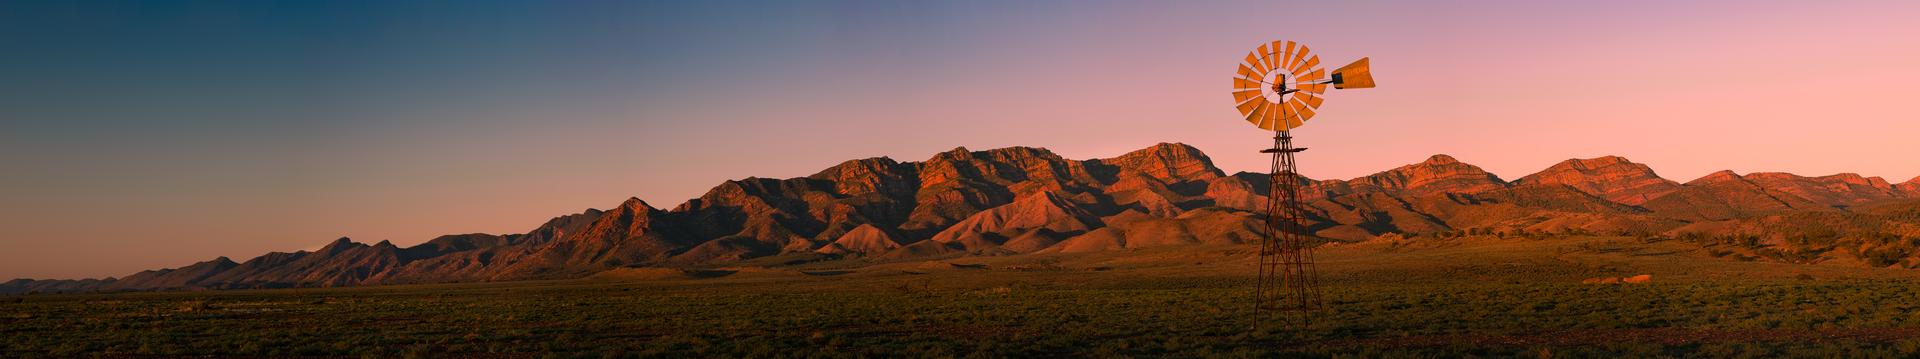 Moralana Rd ~ Flinders Ranges